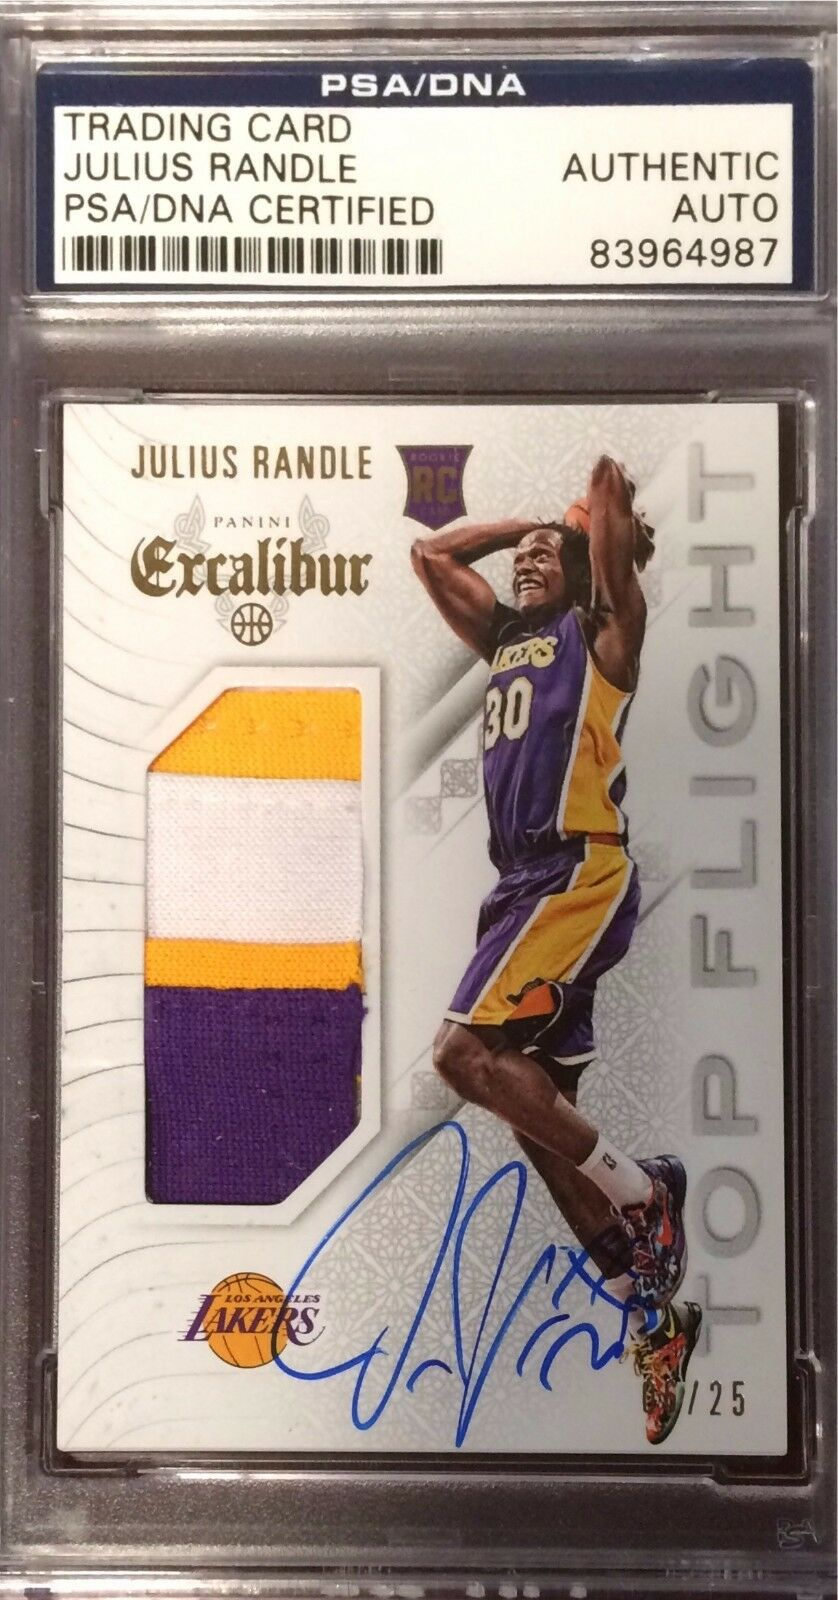 Julius Randle Signed 2015 Panini Excalibur Jersey PSA 83964987